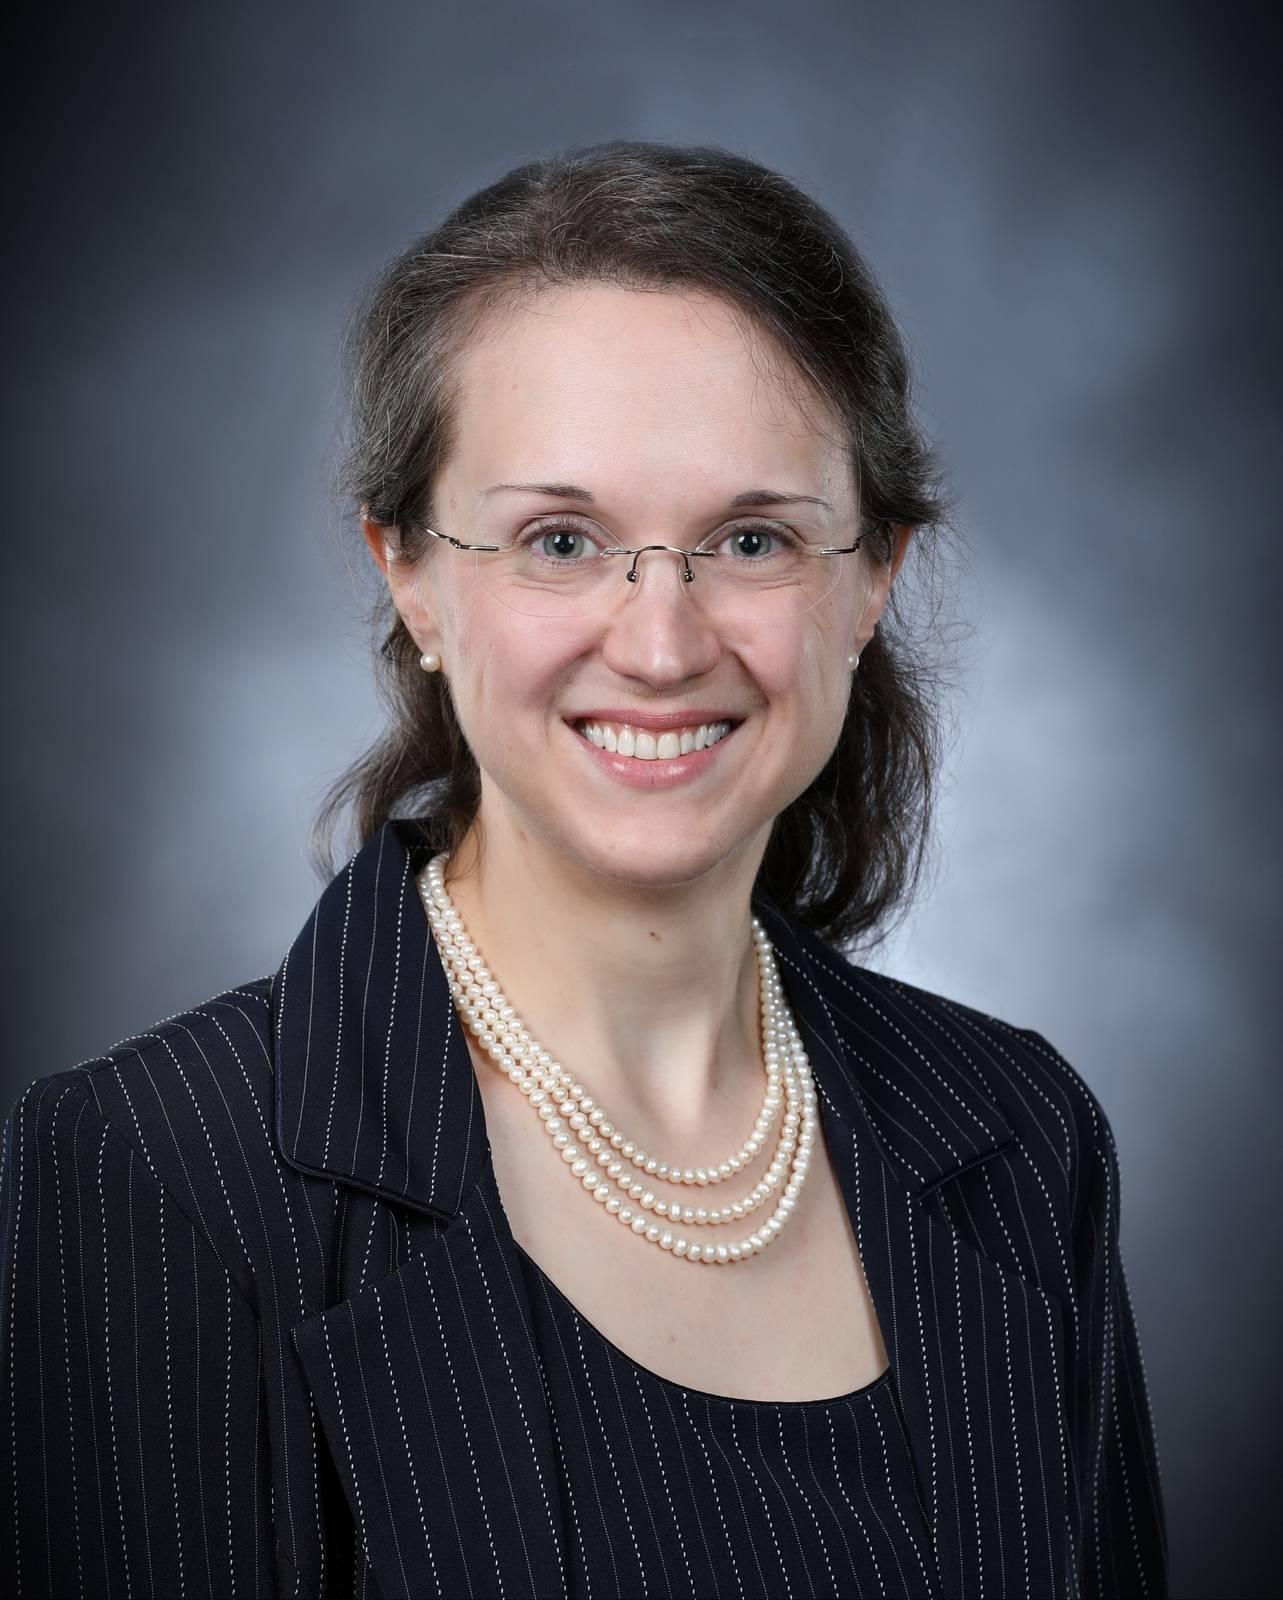 Christina M Knopf